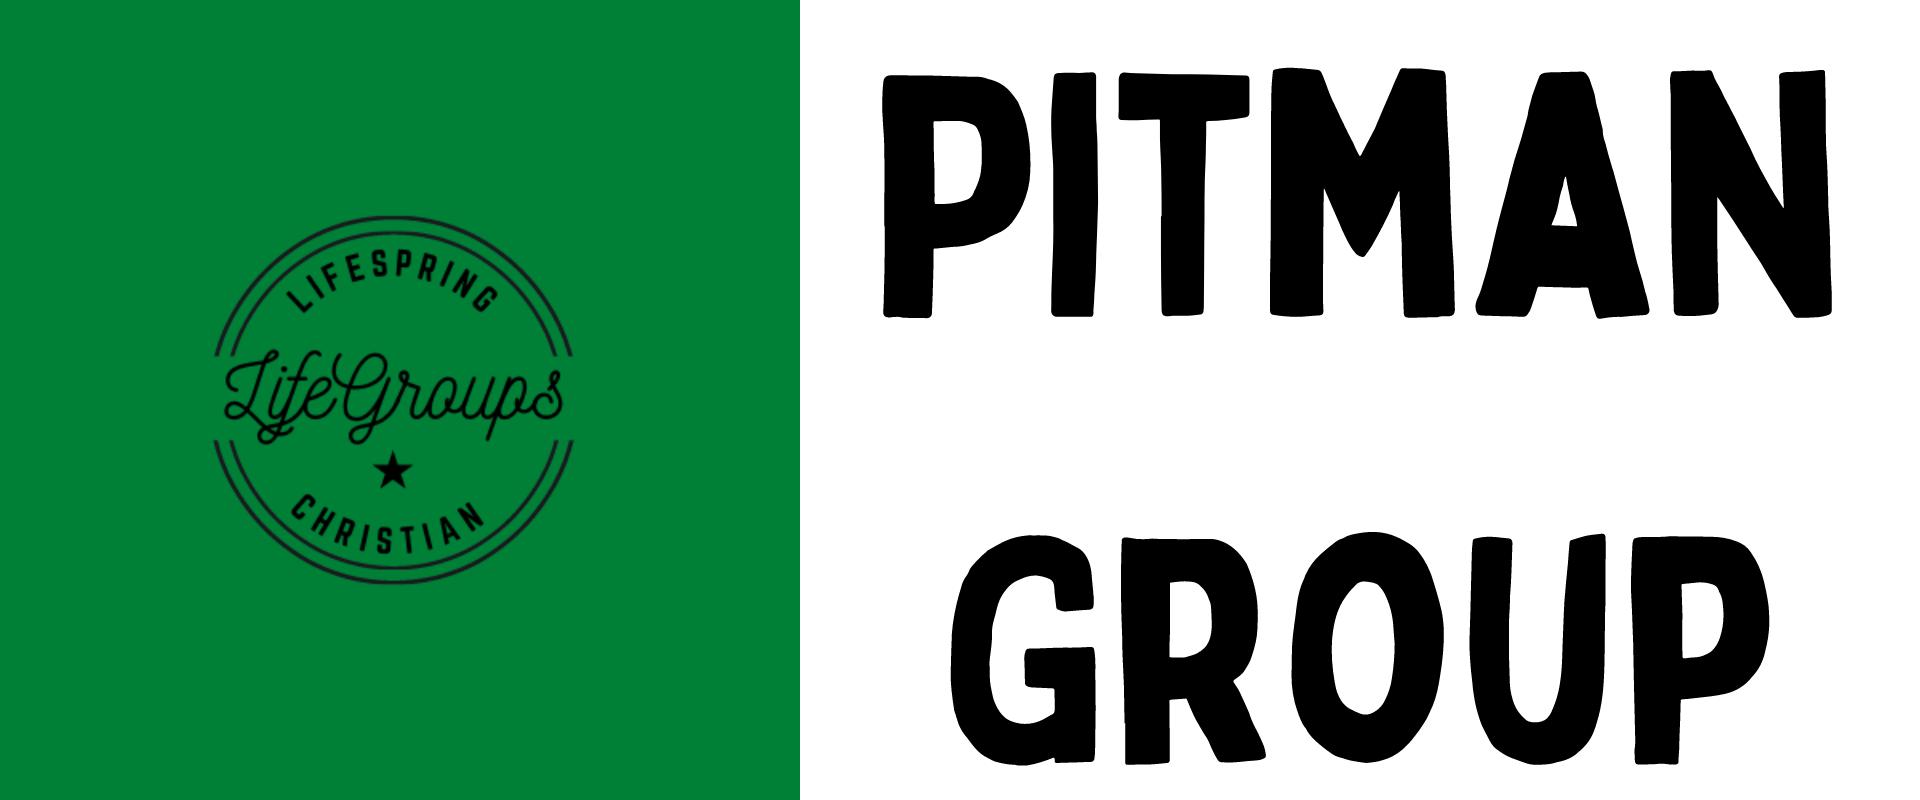 LifeGroup – Pitman Group